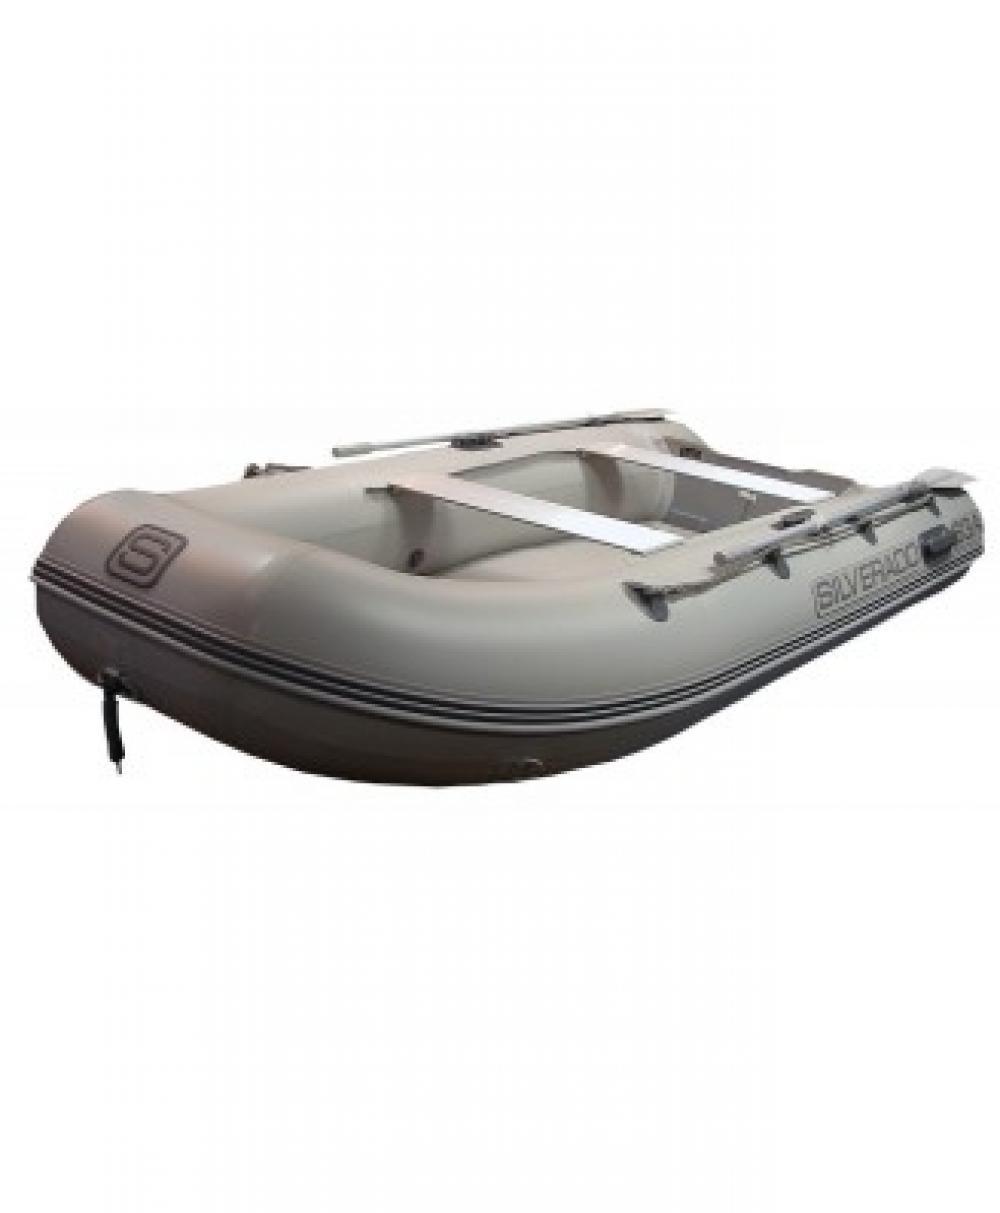 лодка пвх silverado 27f цена